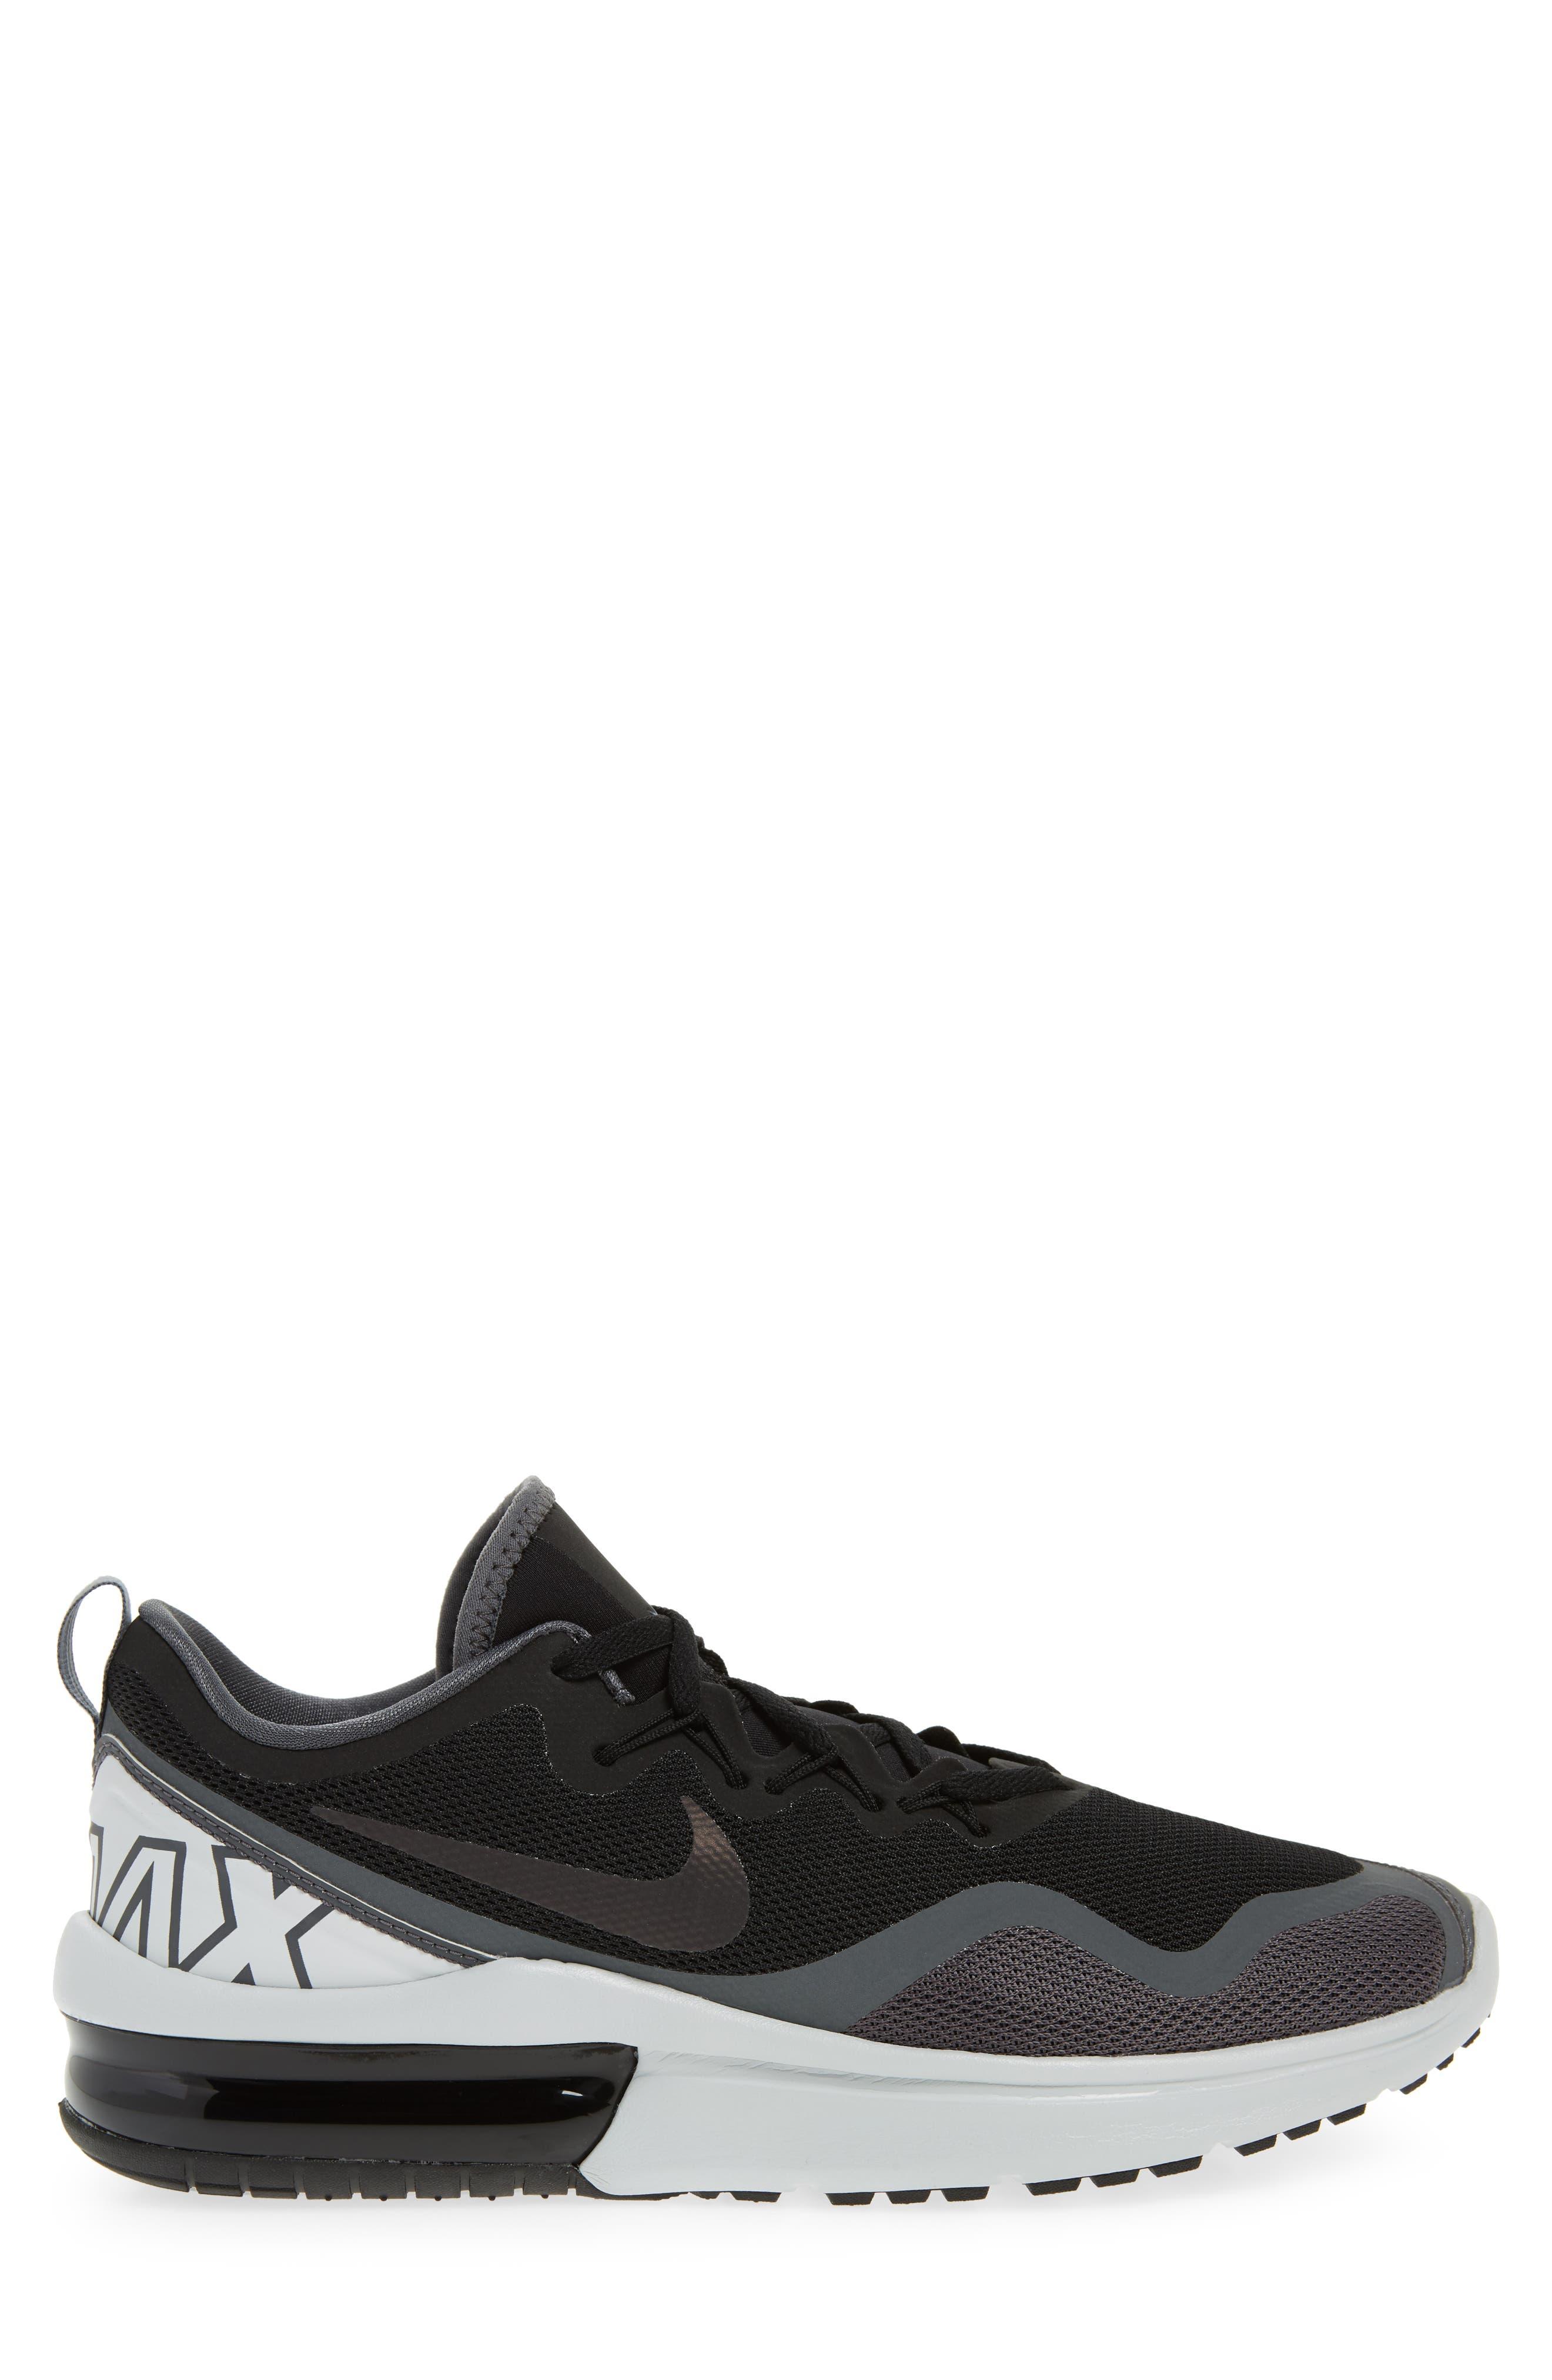 Air Max Fury Running Shoe,                             Alternate thumbnail 3, color,                             009